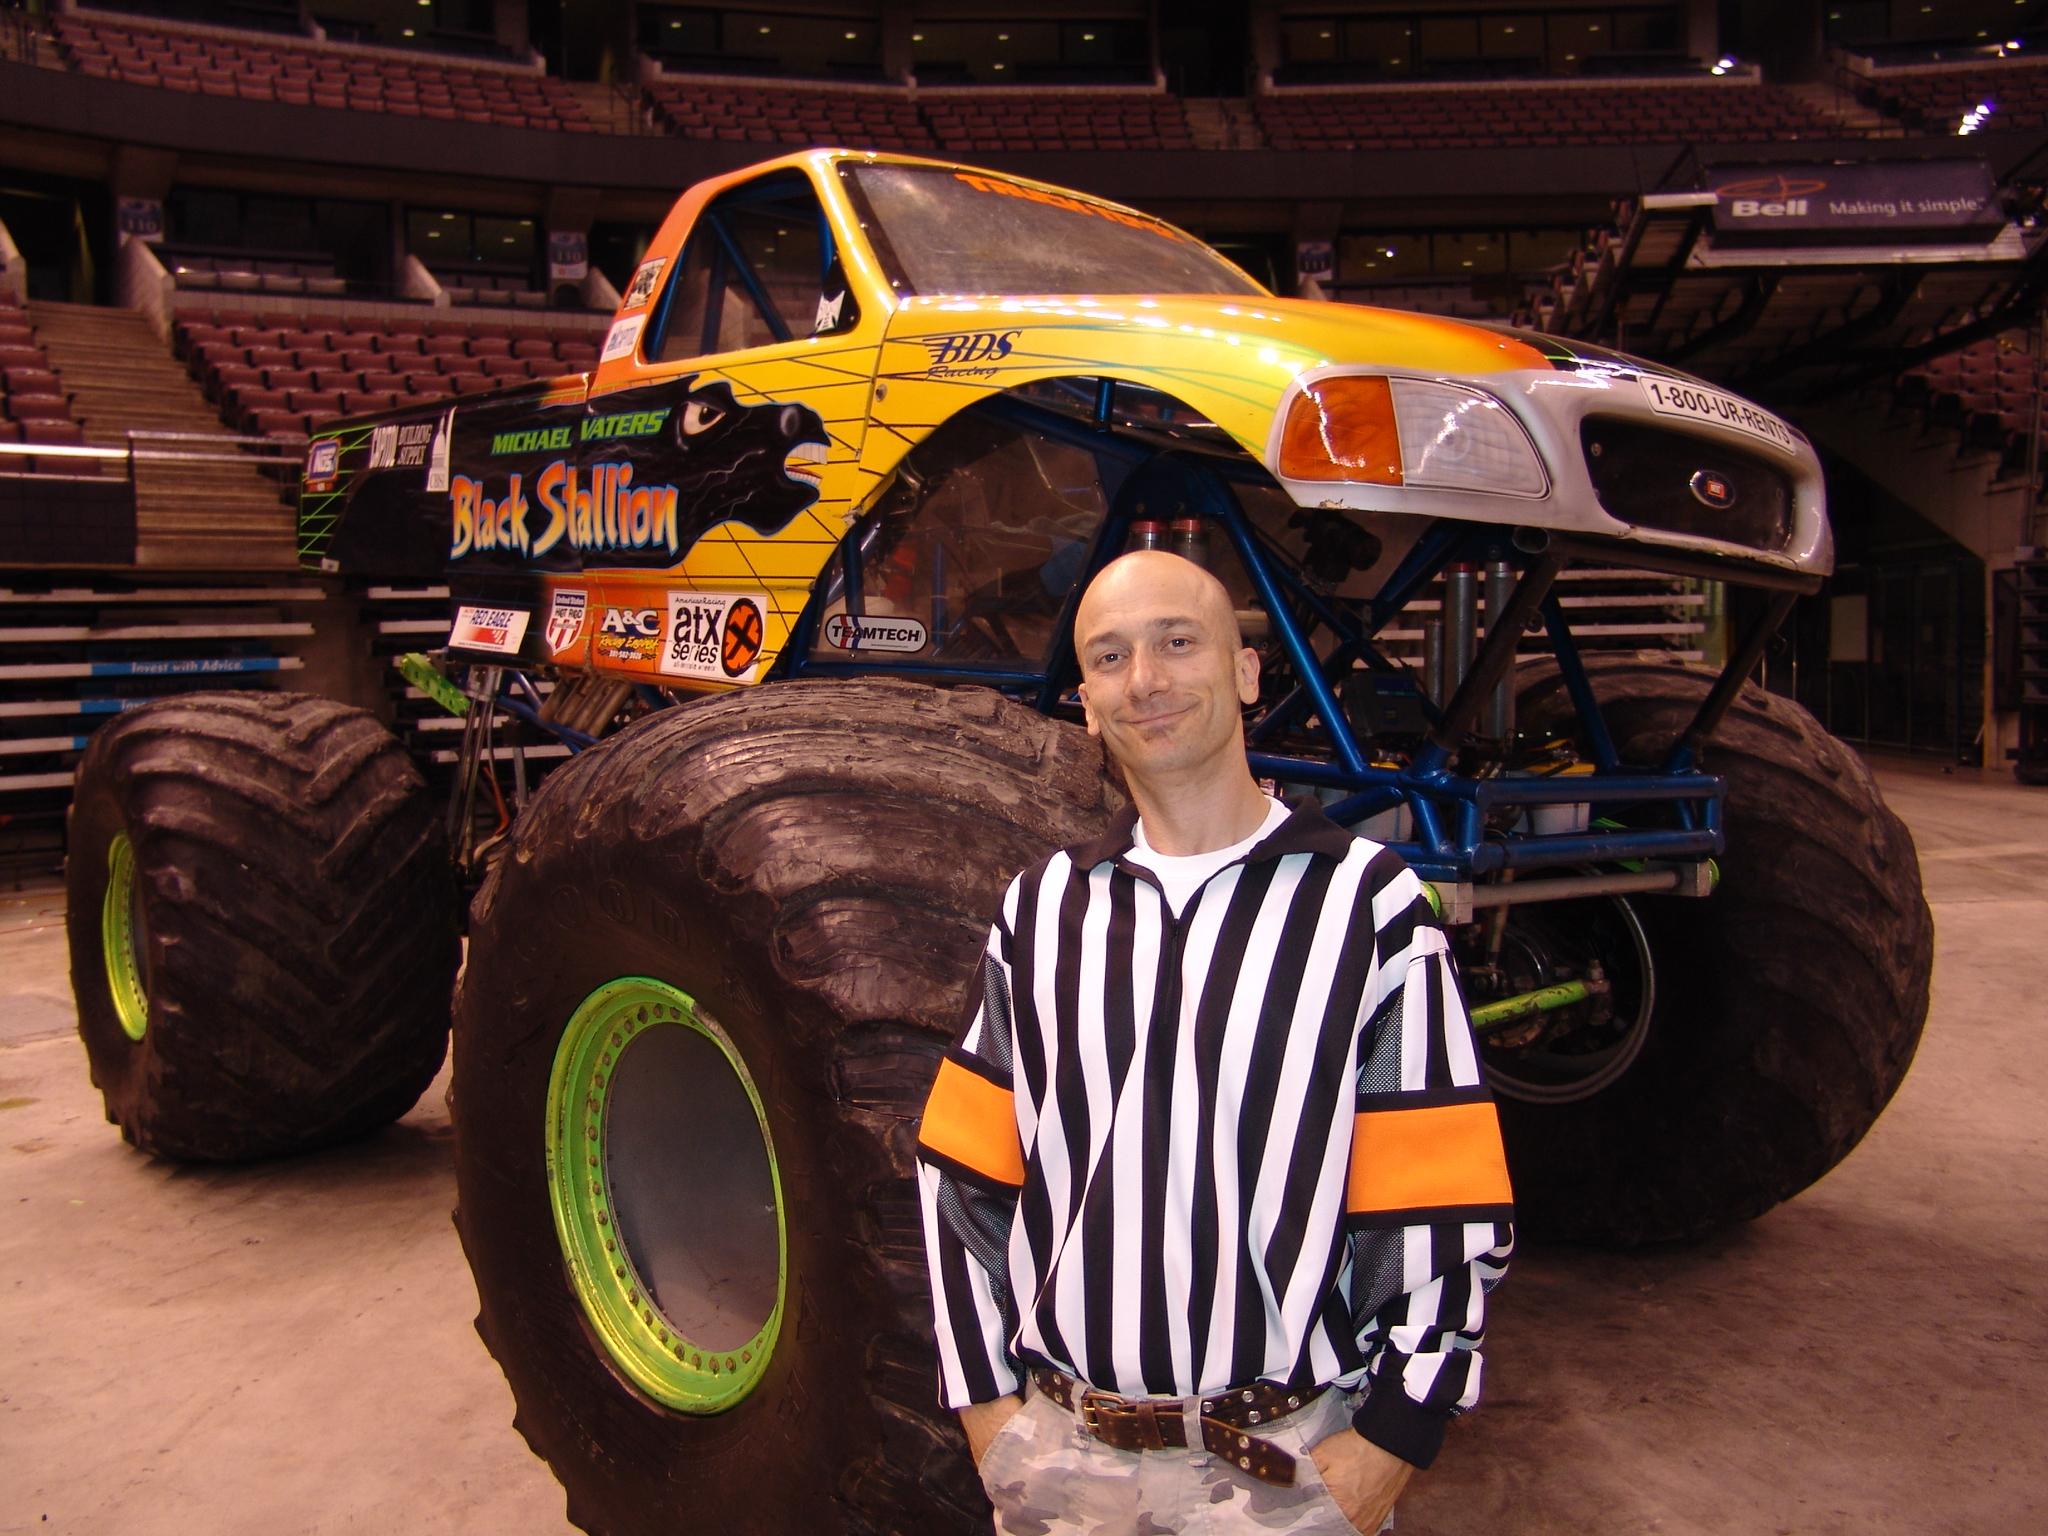 Bigfoot Ottawa 24 juin 2006 prodyaz.com (30)